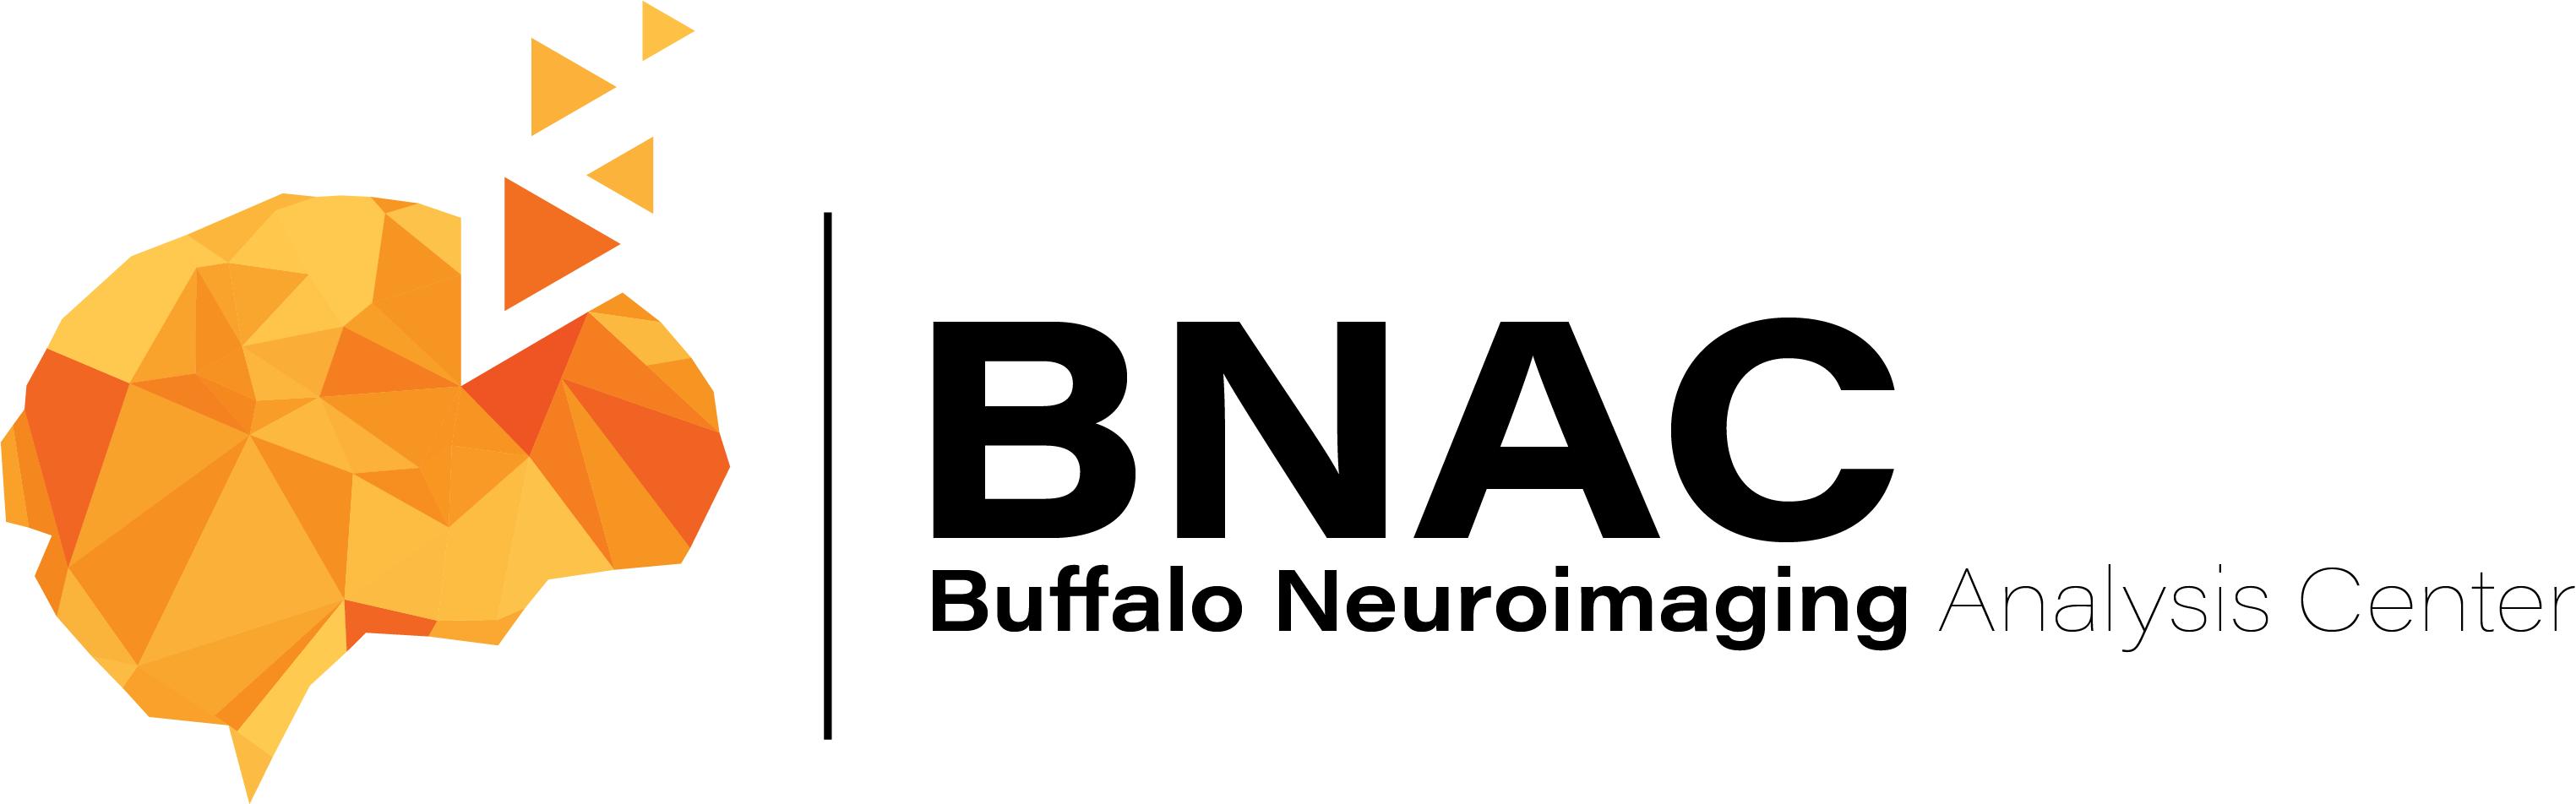 Buffalo Neuroimaging Analysis Center logo